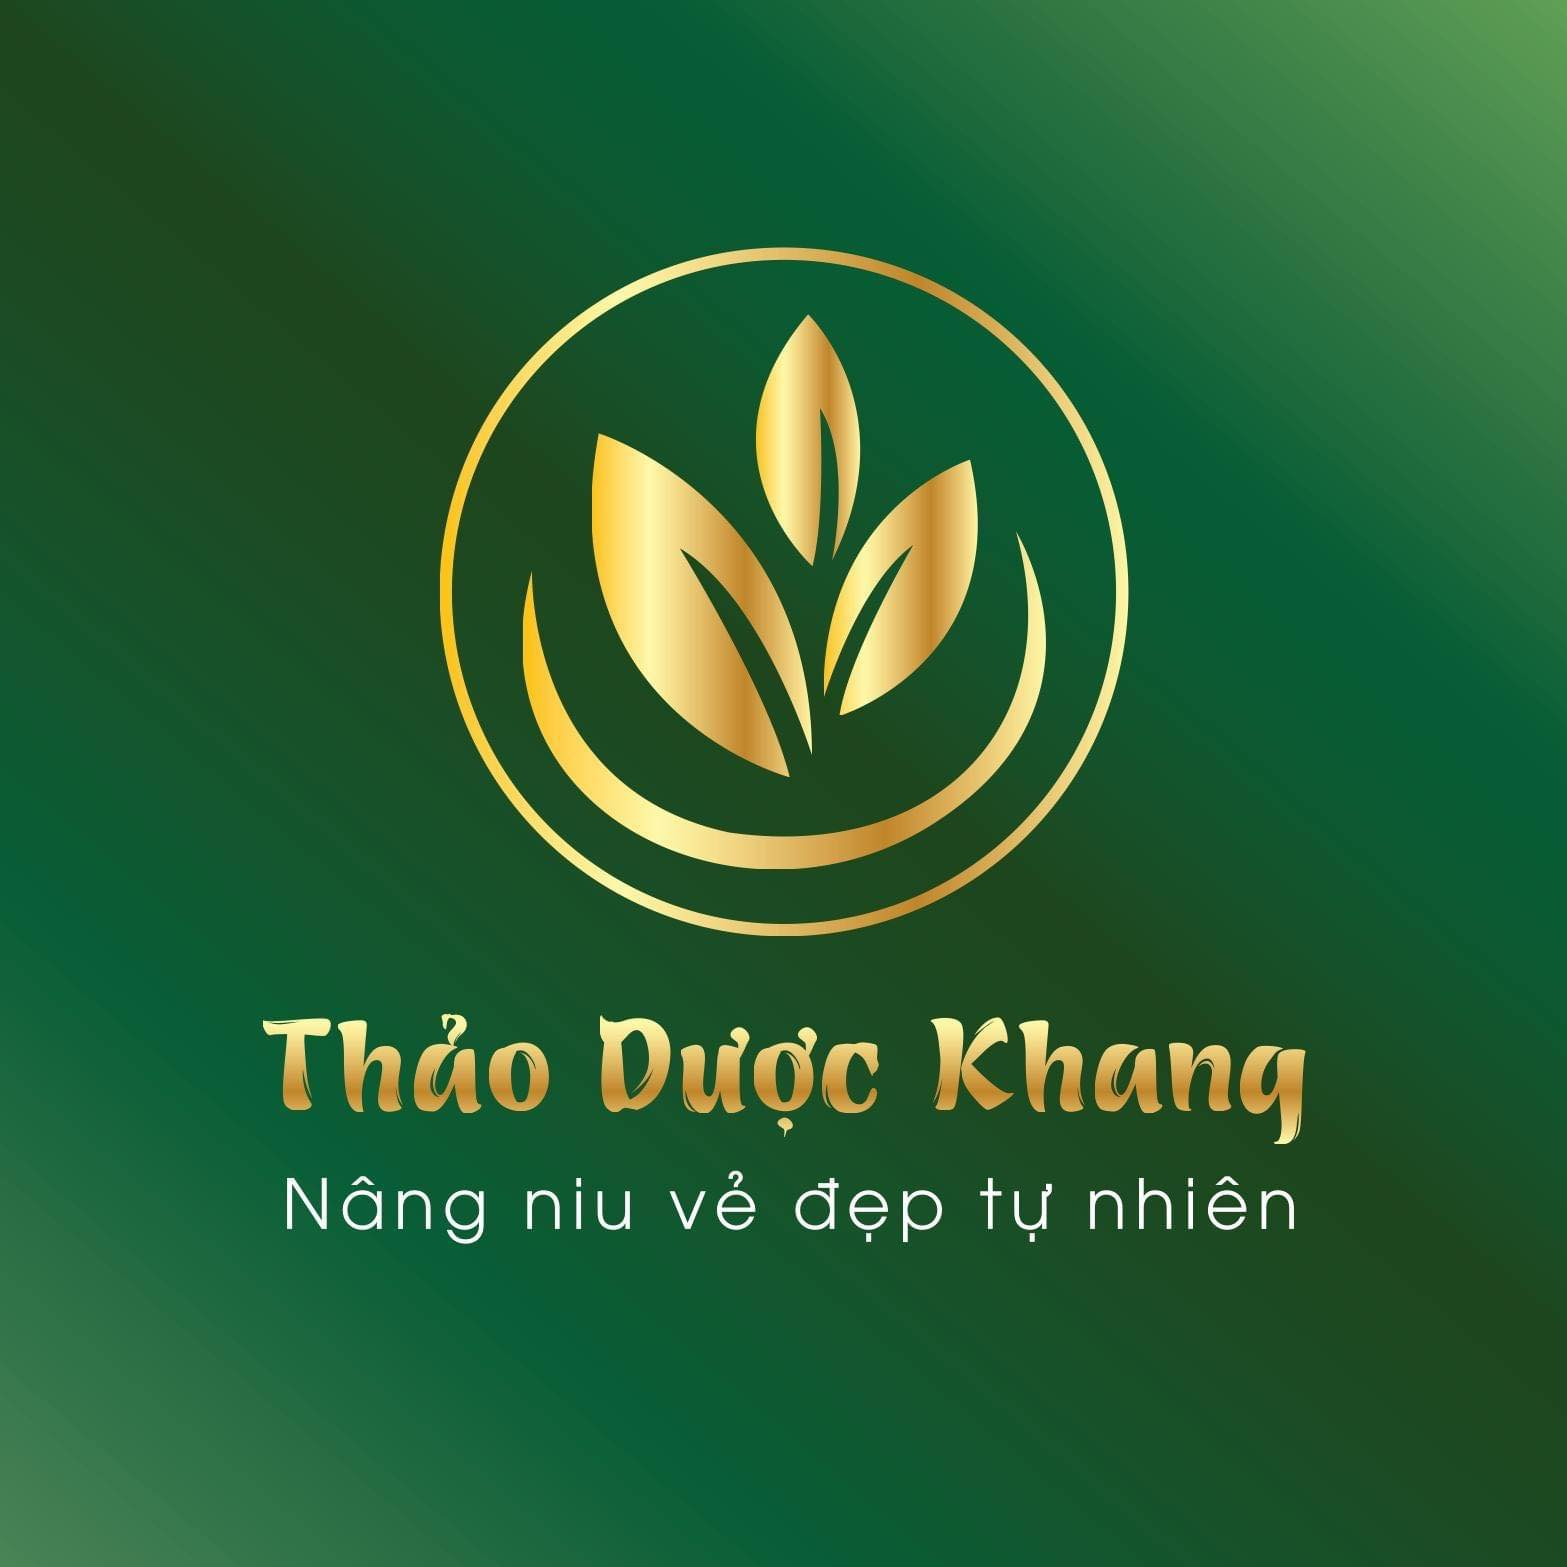 THAODUOCKHANG